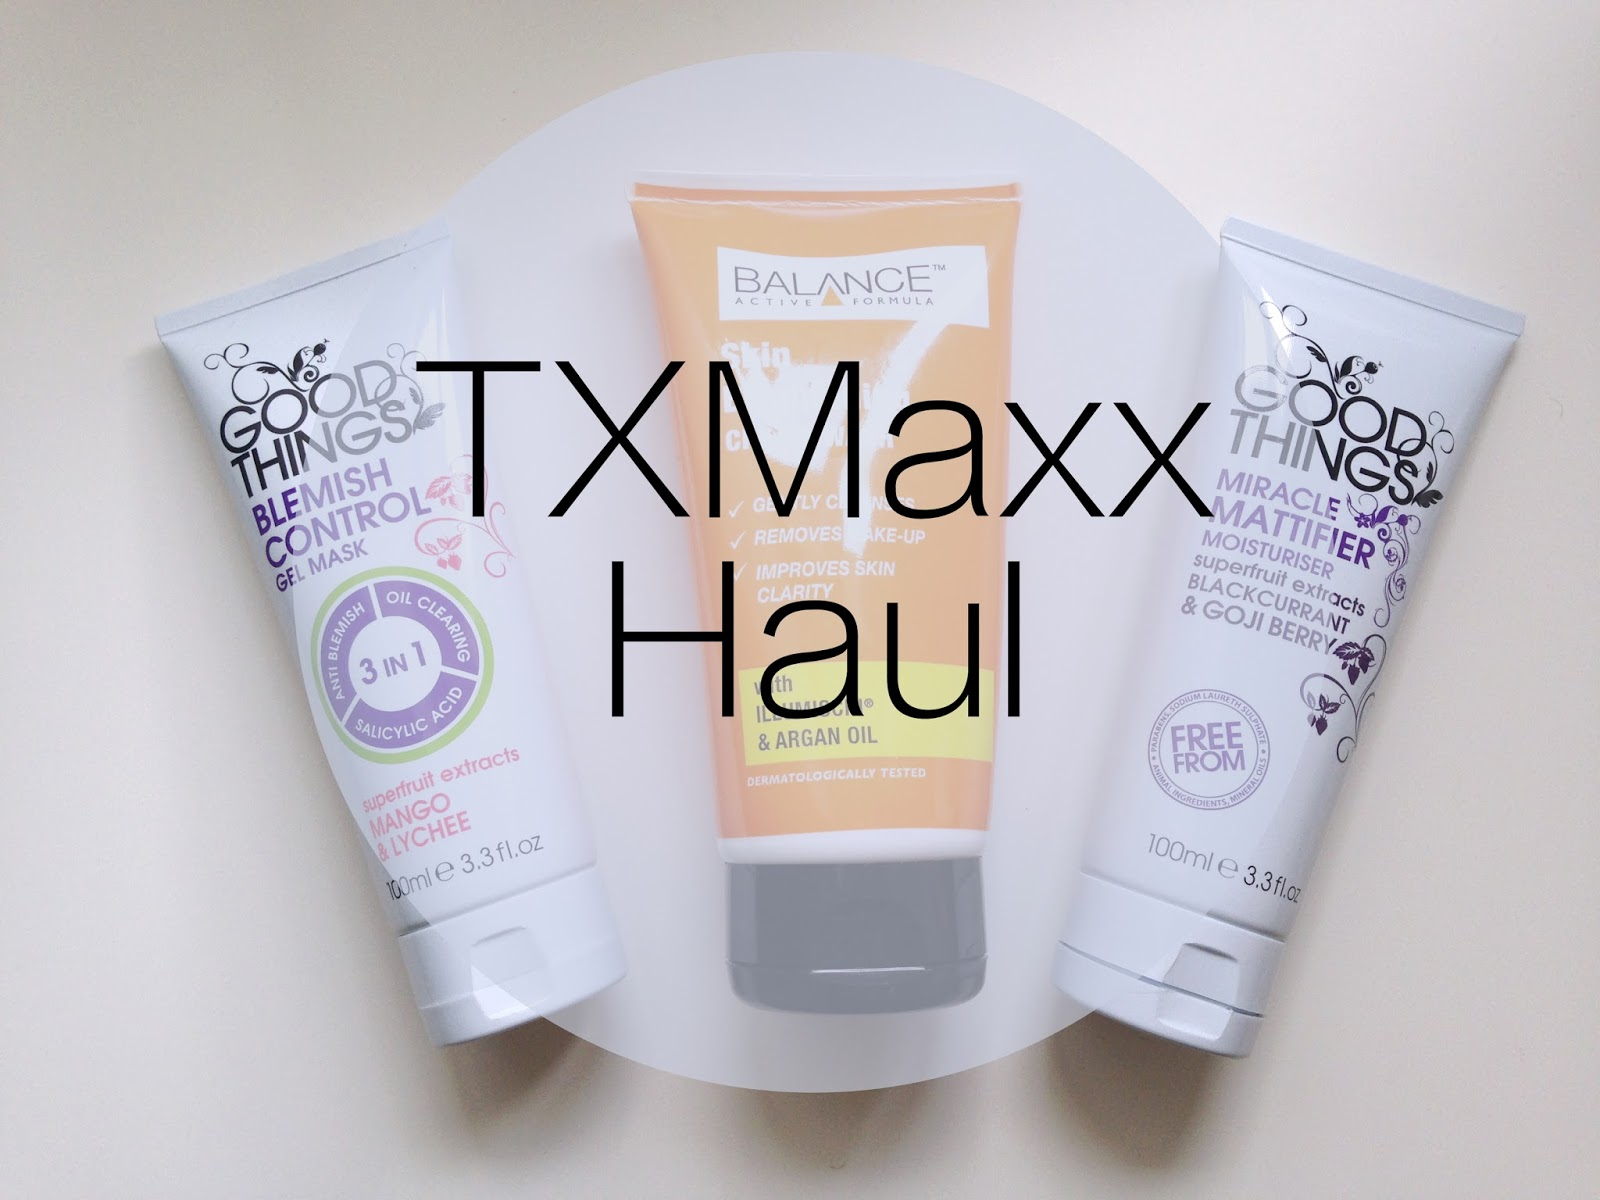 TXMaxx Haul